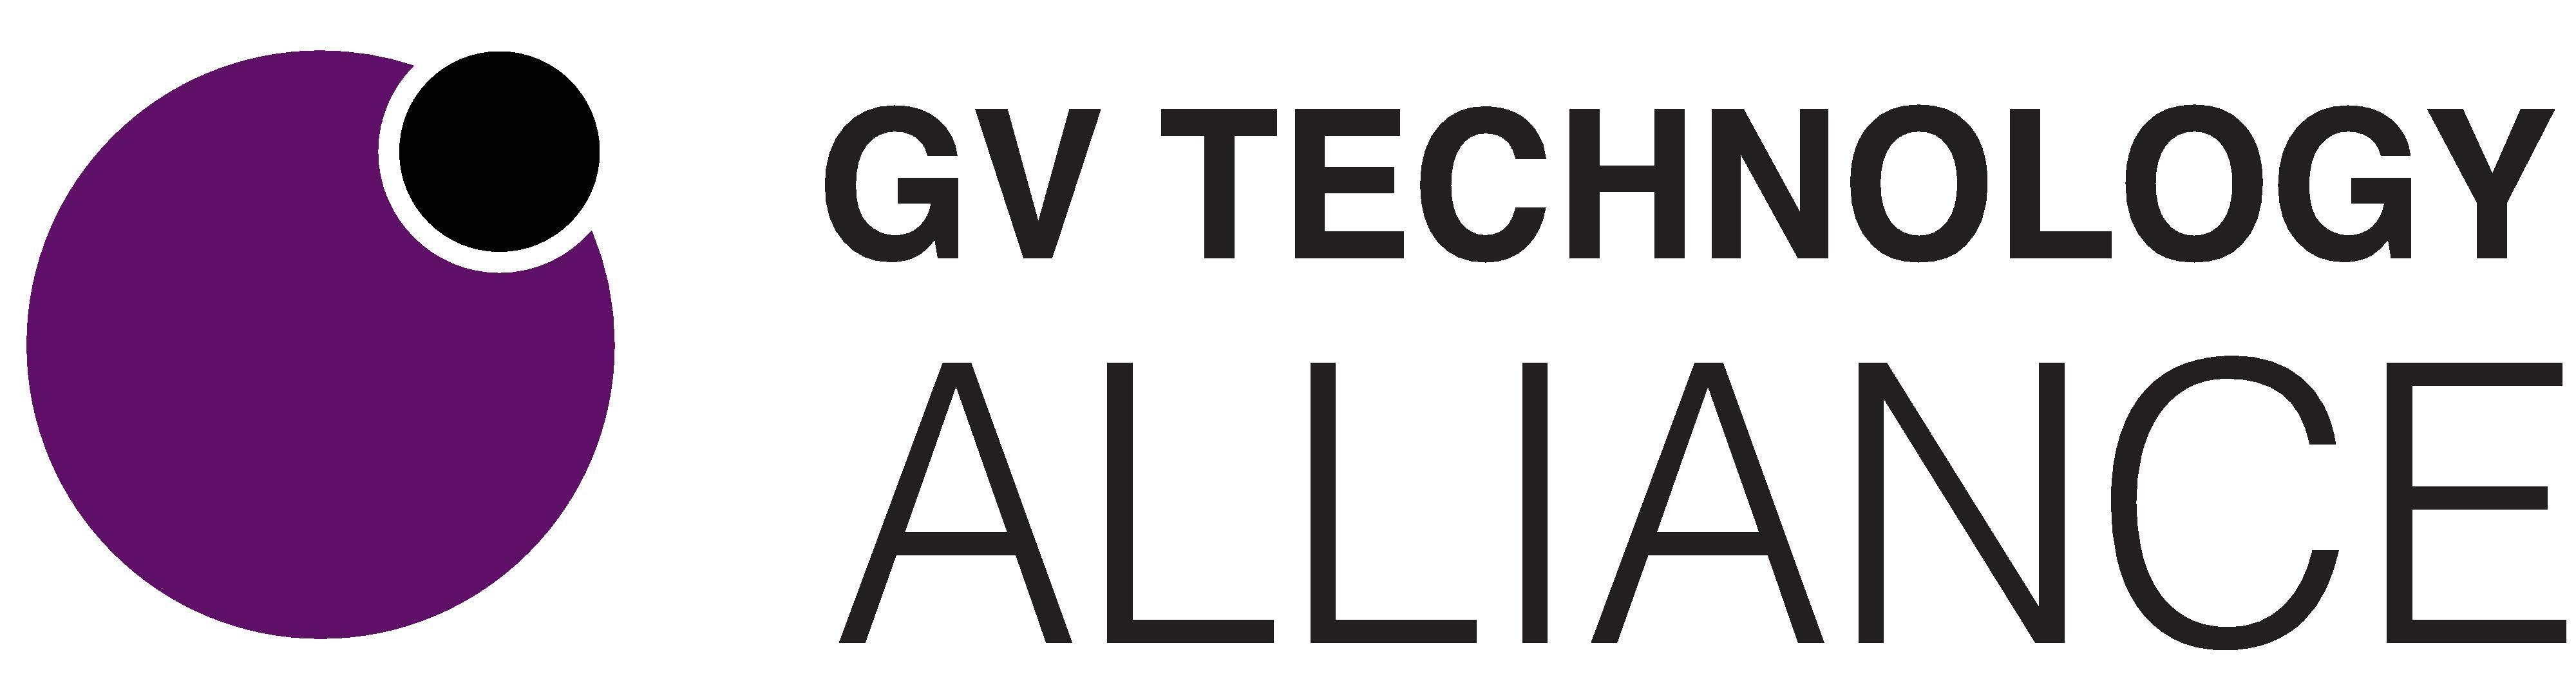 GV_TechAlliance_Logo_CMYK-page-001